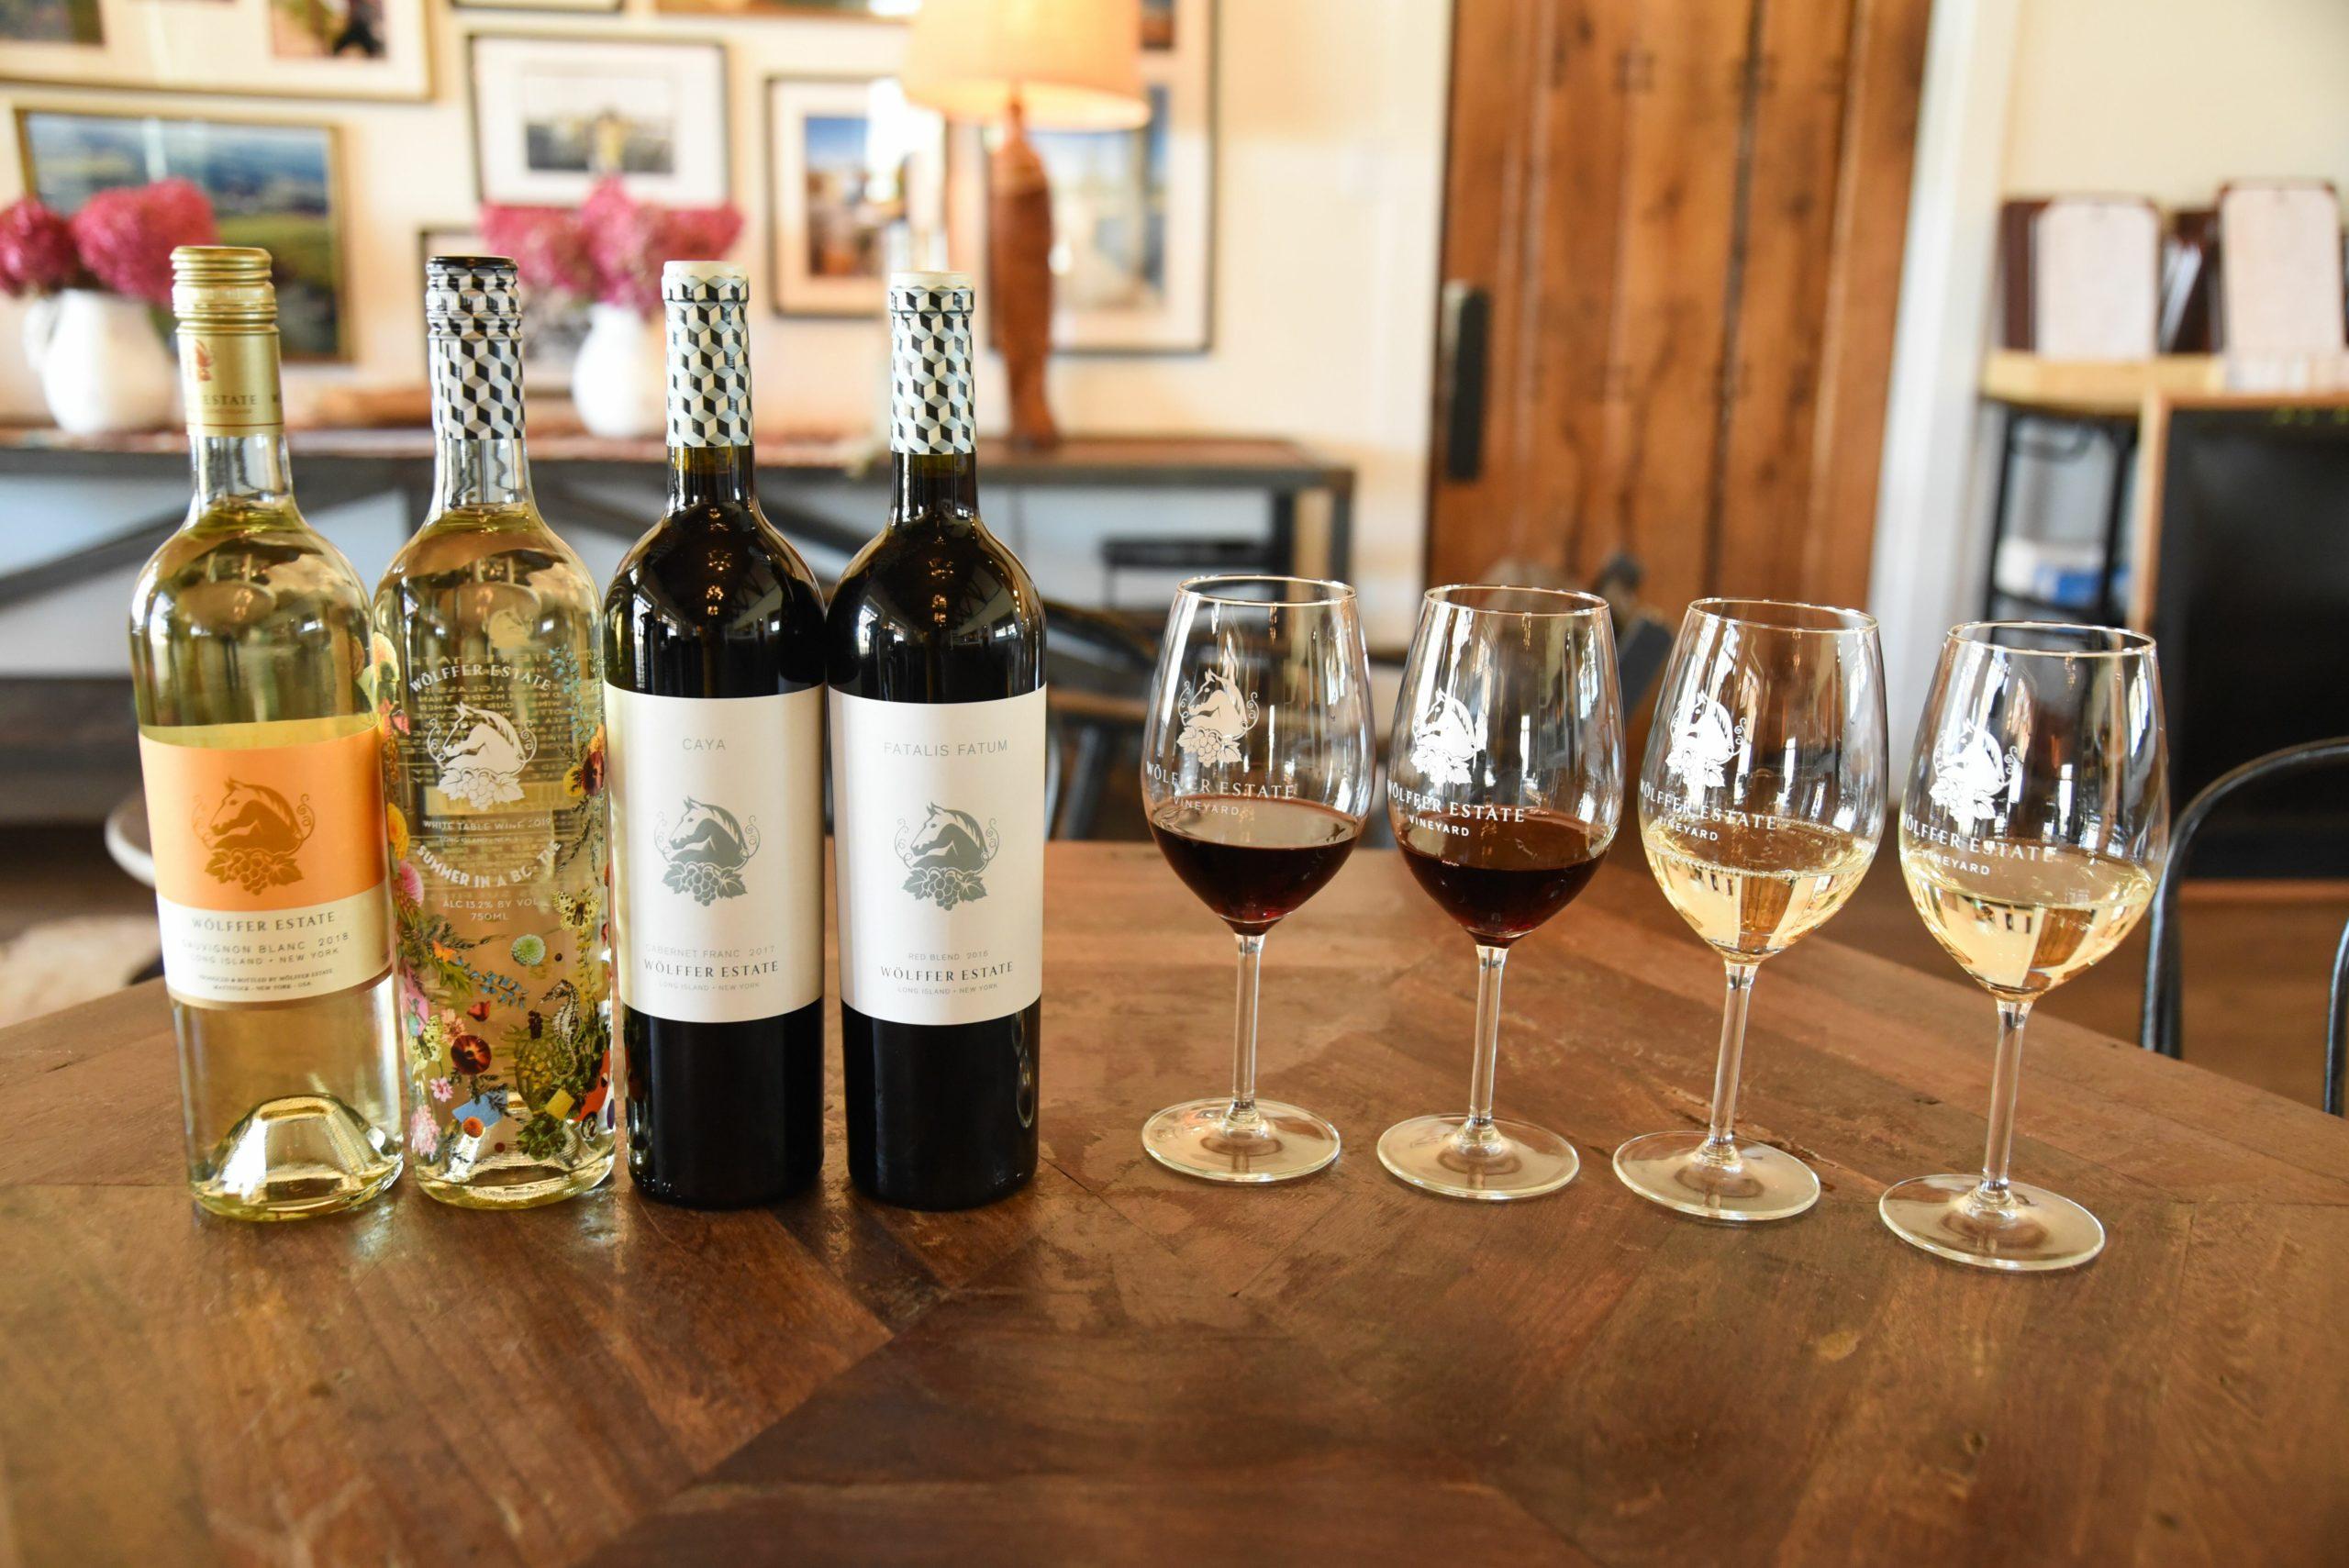 Wolffer Estate Vineyard's Grand Cru Tasting line-up.